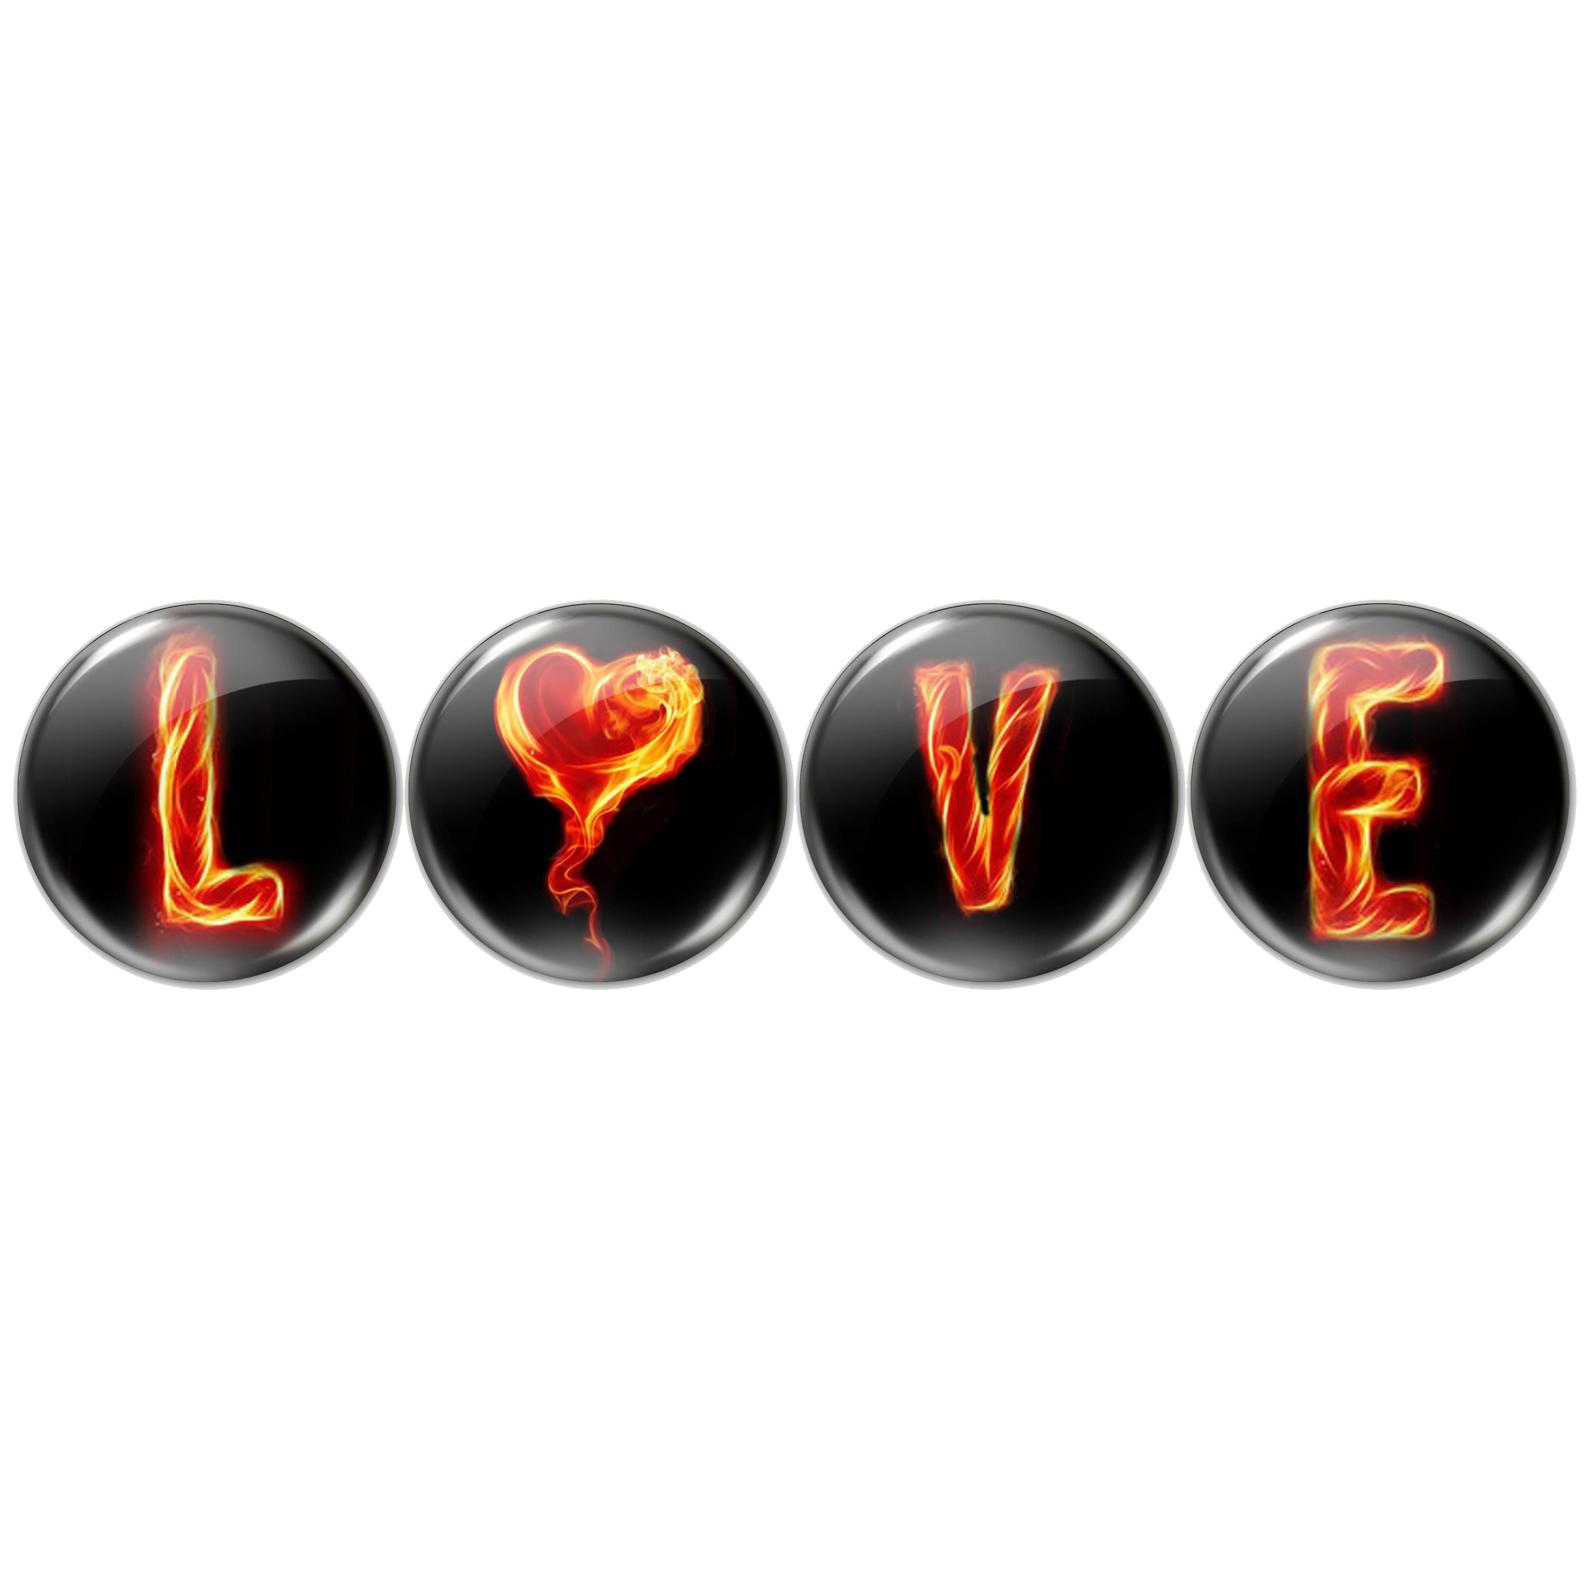 مگنت طرح love کد  m24050 مجموعه 4 عددی